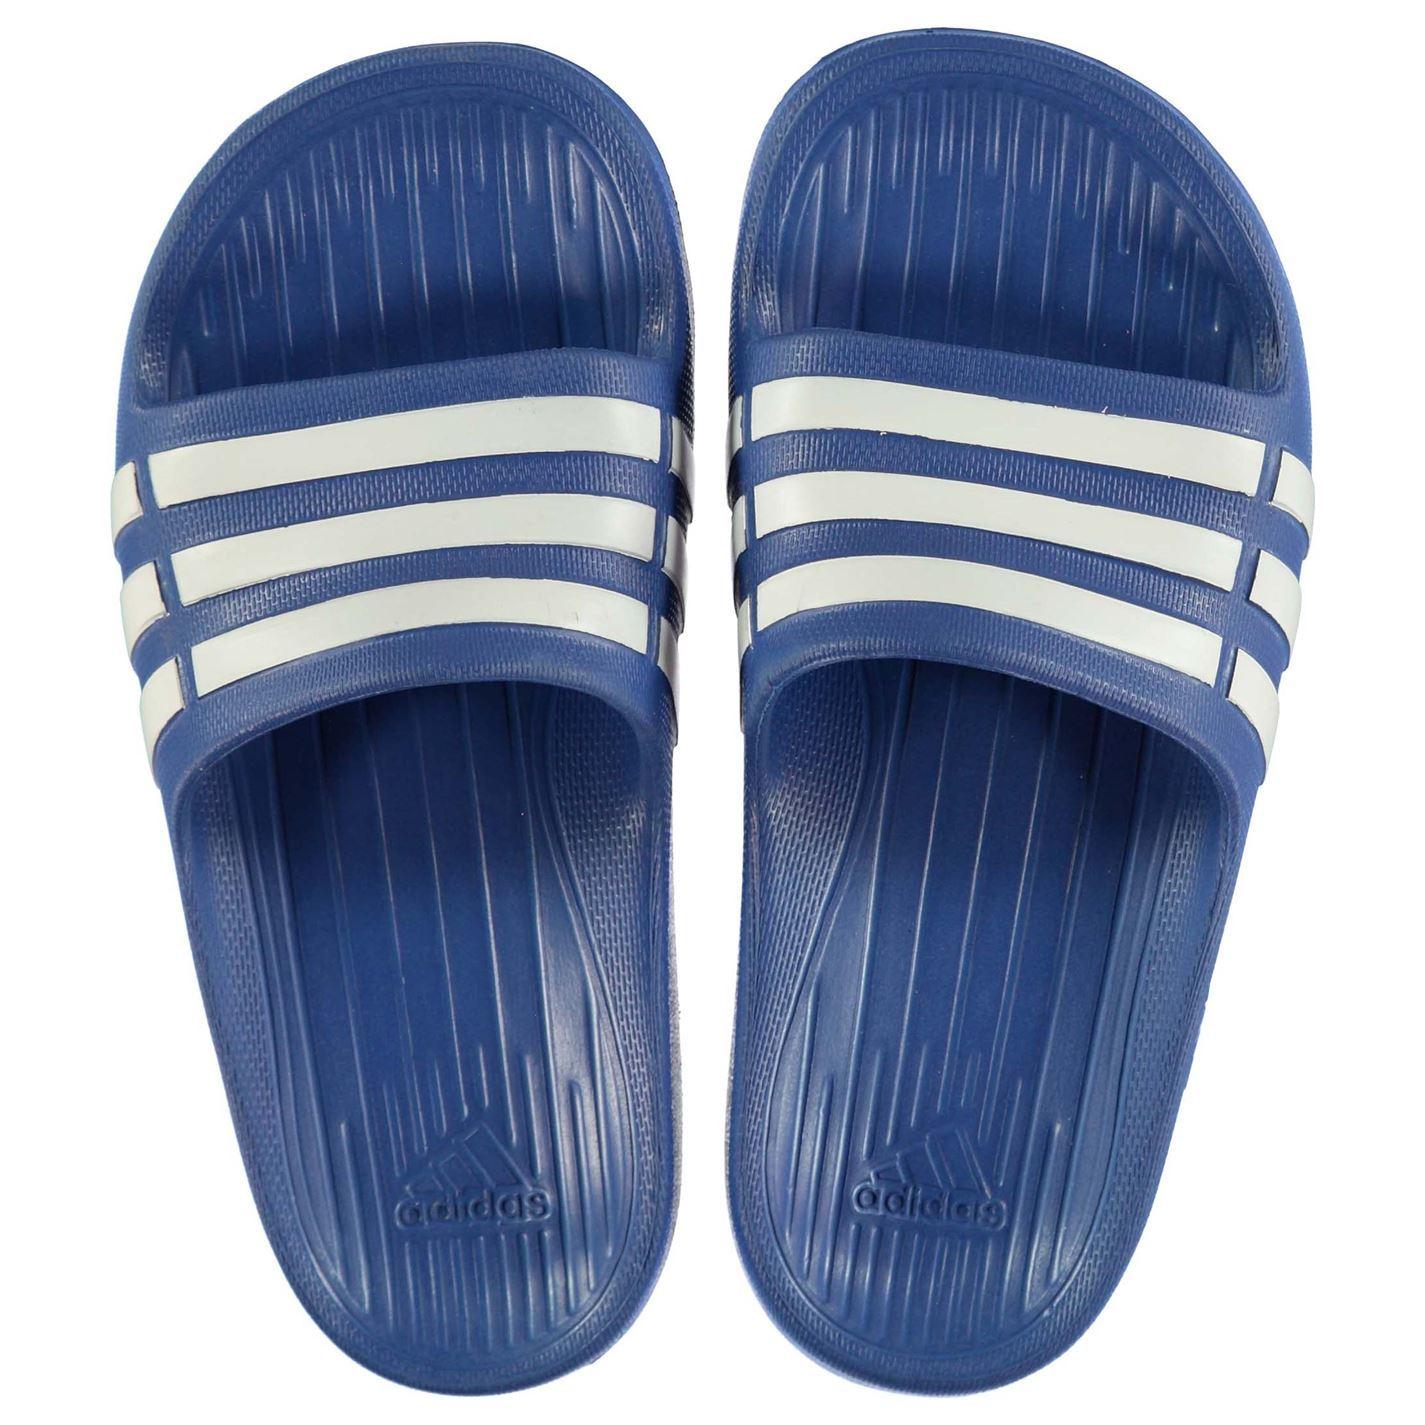 miniatura 9 - ADIDAS-Duramo-Slide-Piscina-Scarpe-Bambino-Ragazzo-Sandali-Infradito-Spiaggia-Scarpe-Thongs